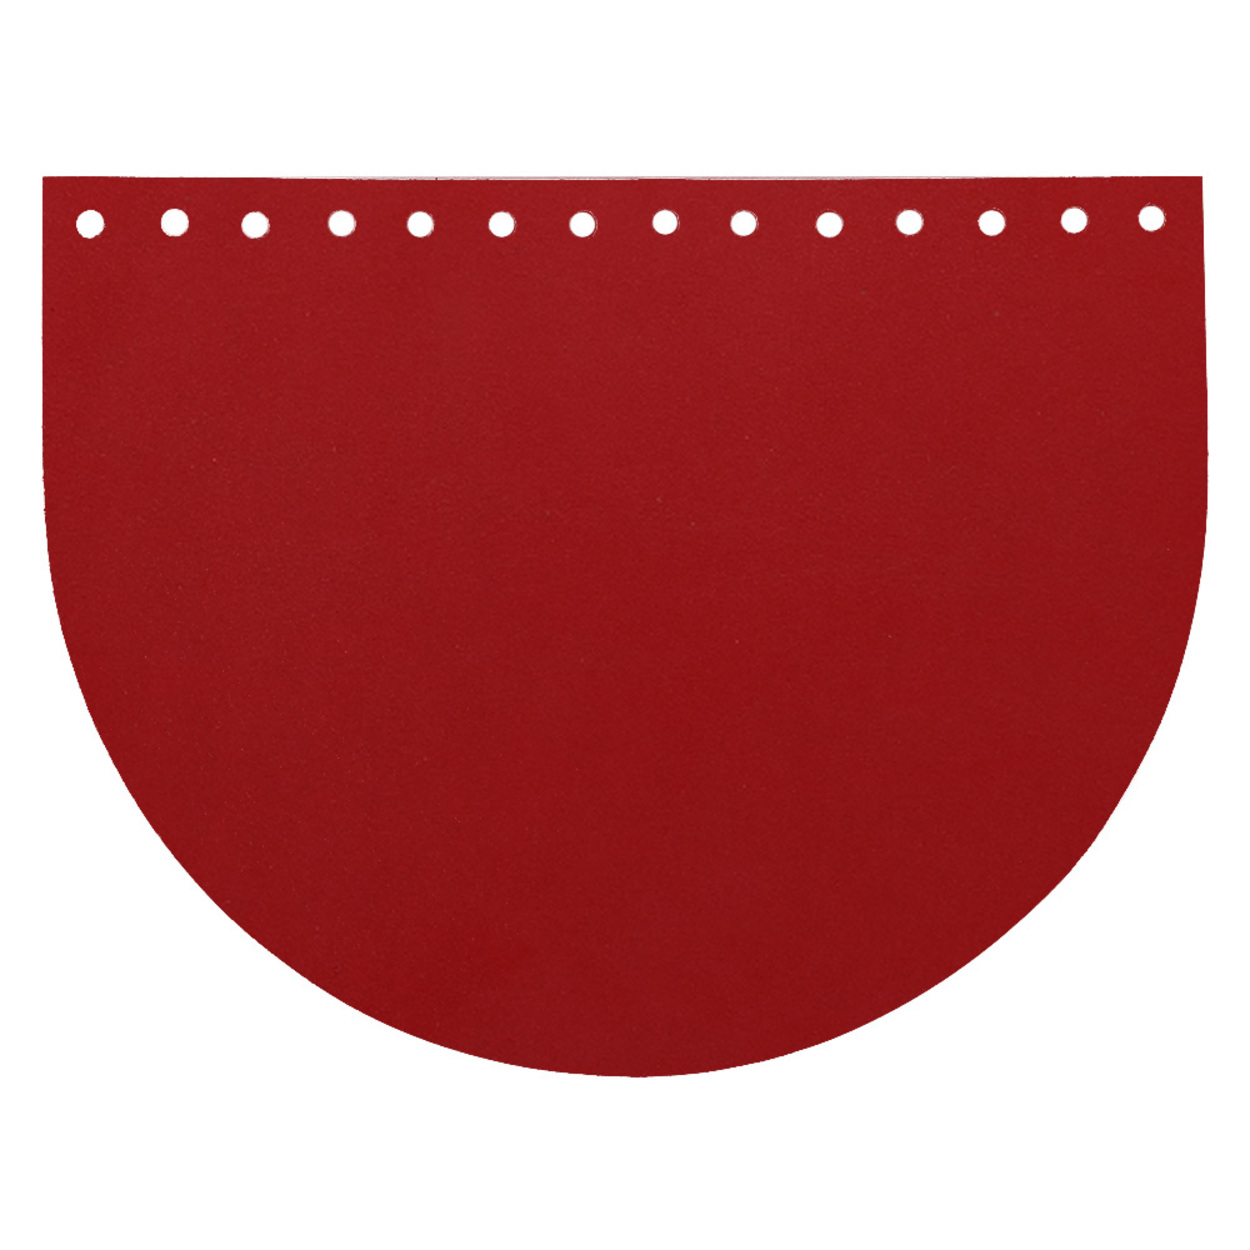 Кожа - Крышка-клапан овал 15 х 20 см. Red hot